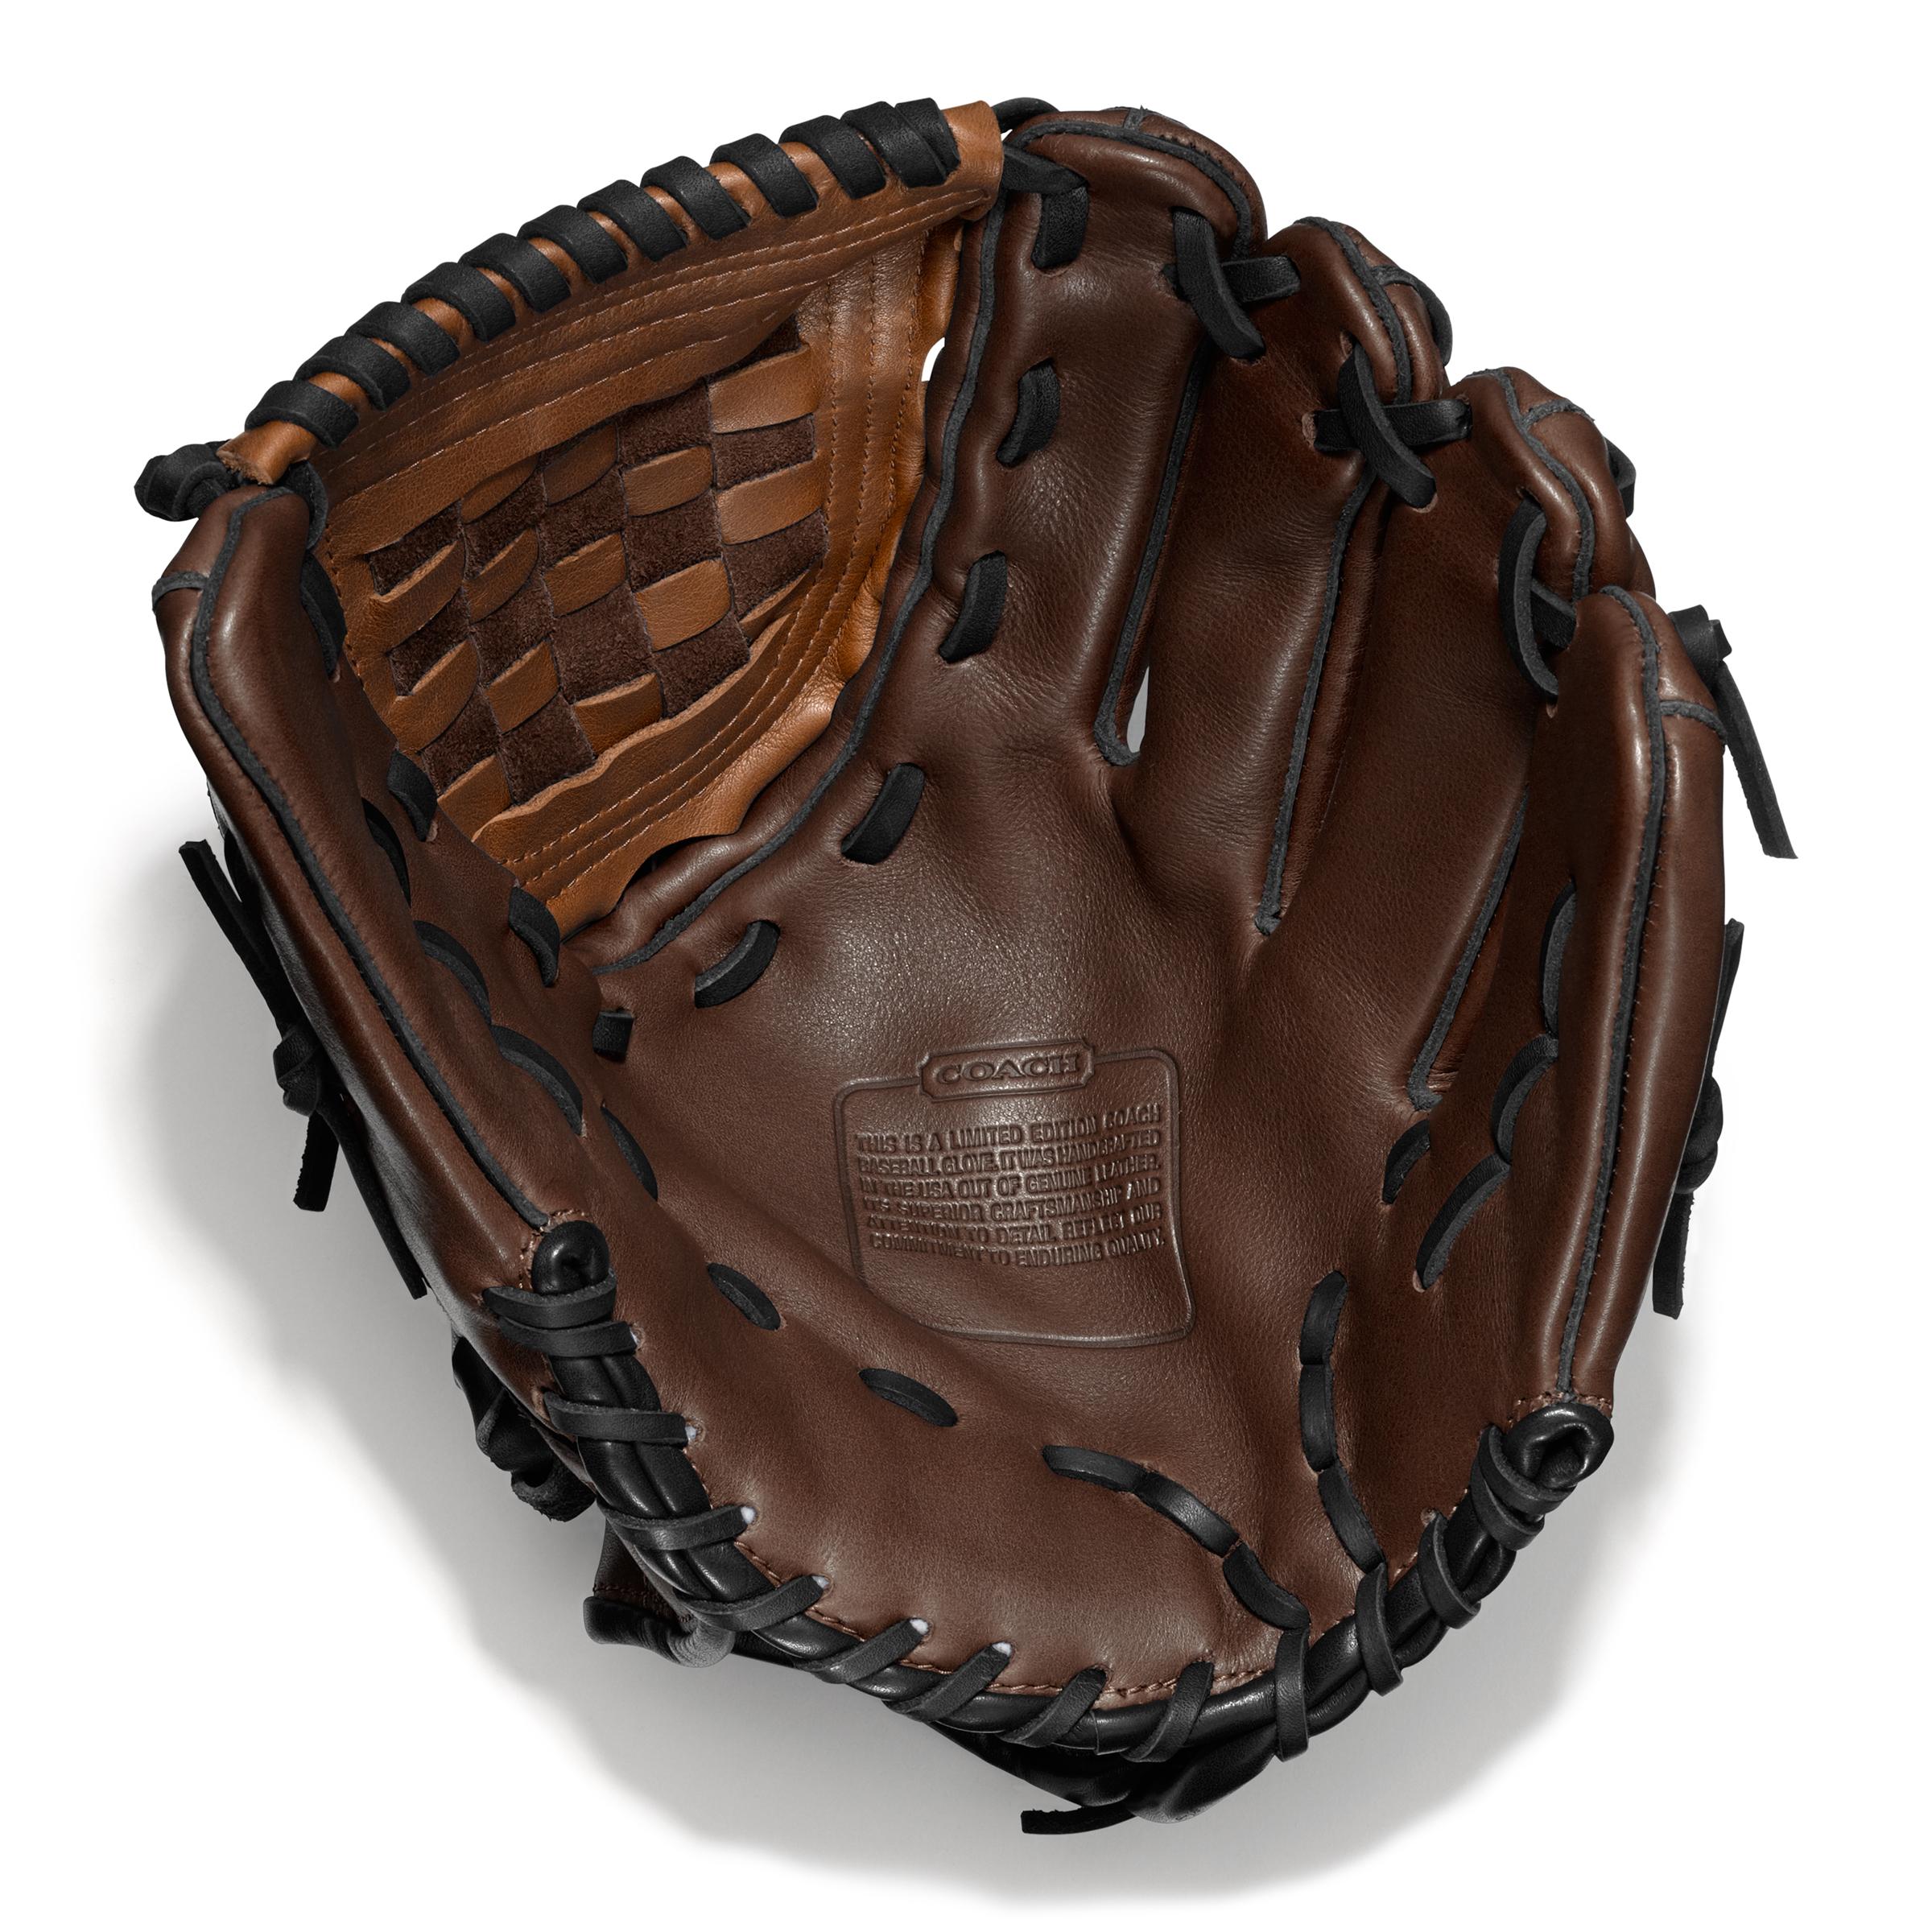 Leather clipart baseball mitt Free on Clip Art More